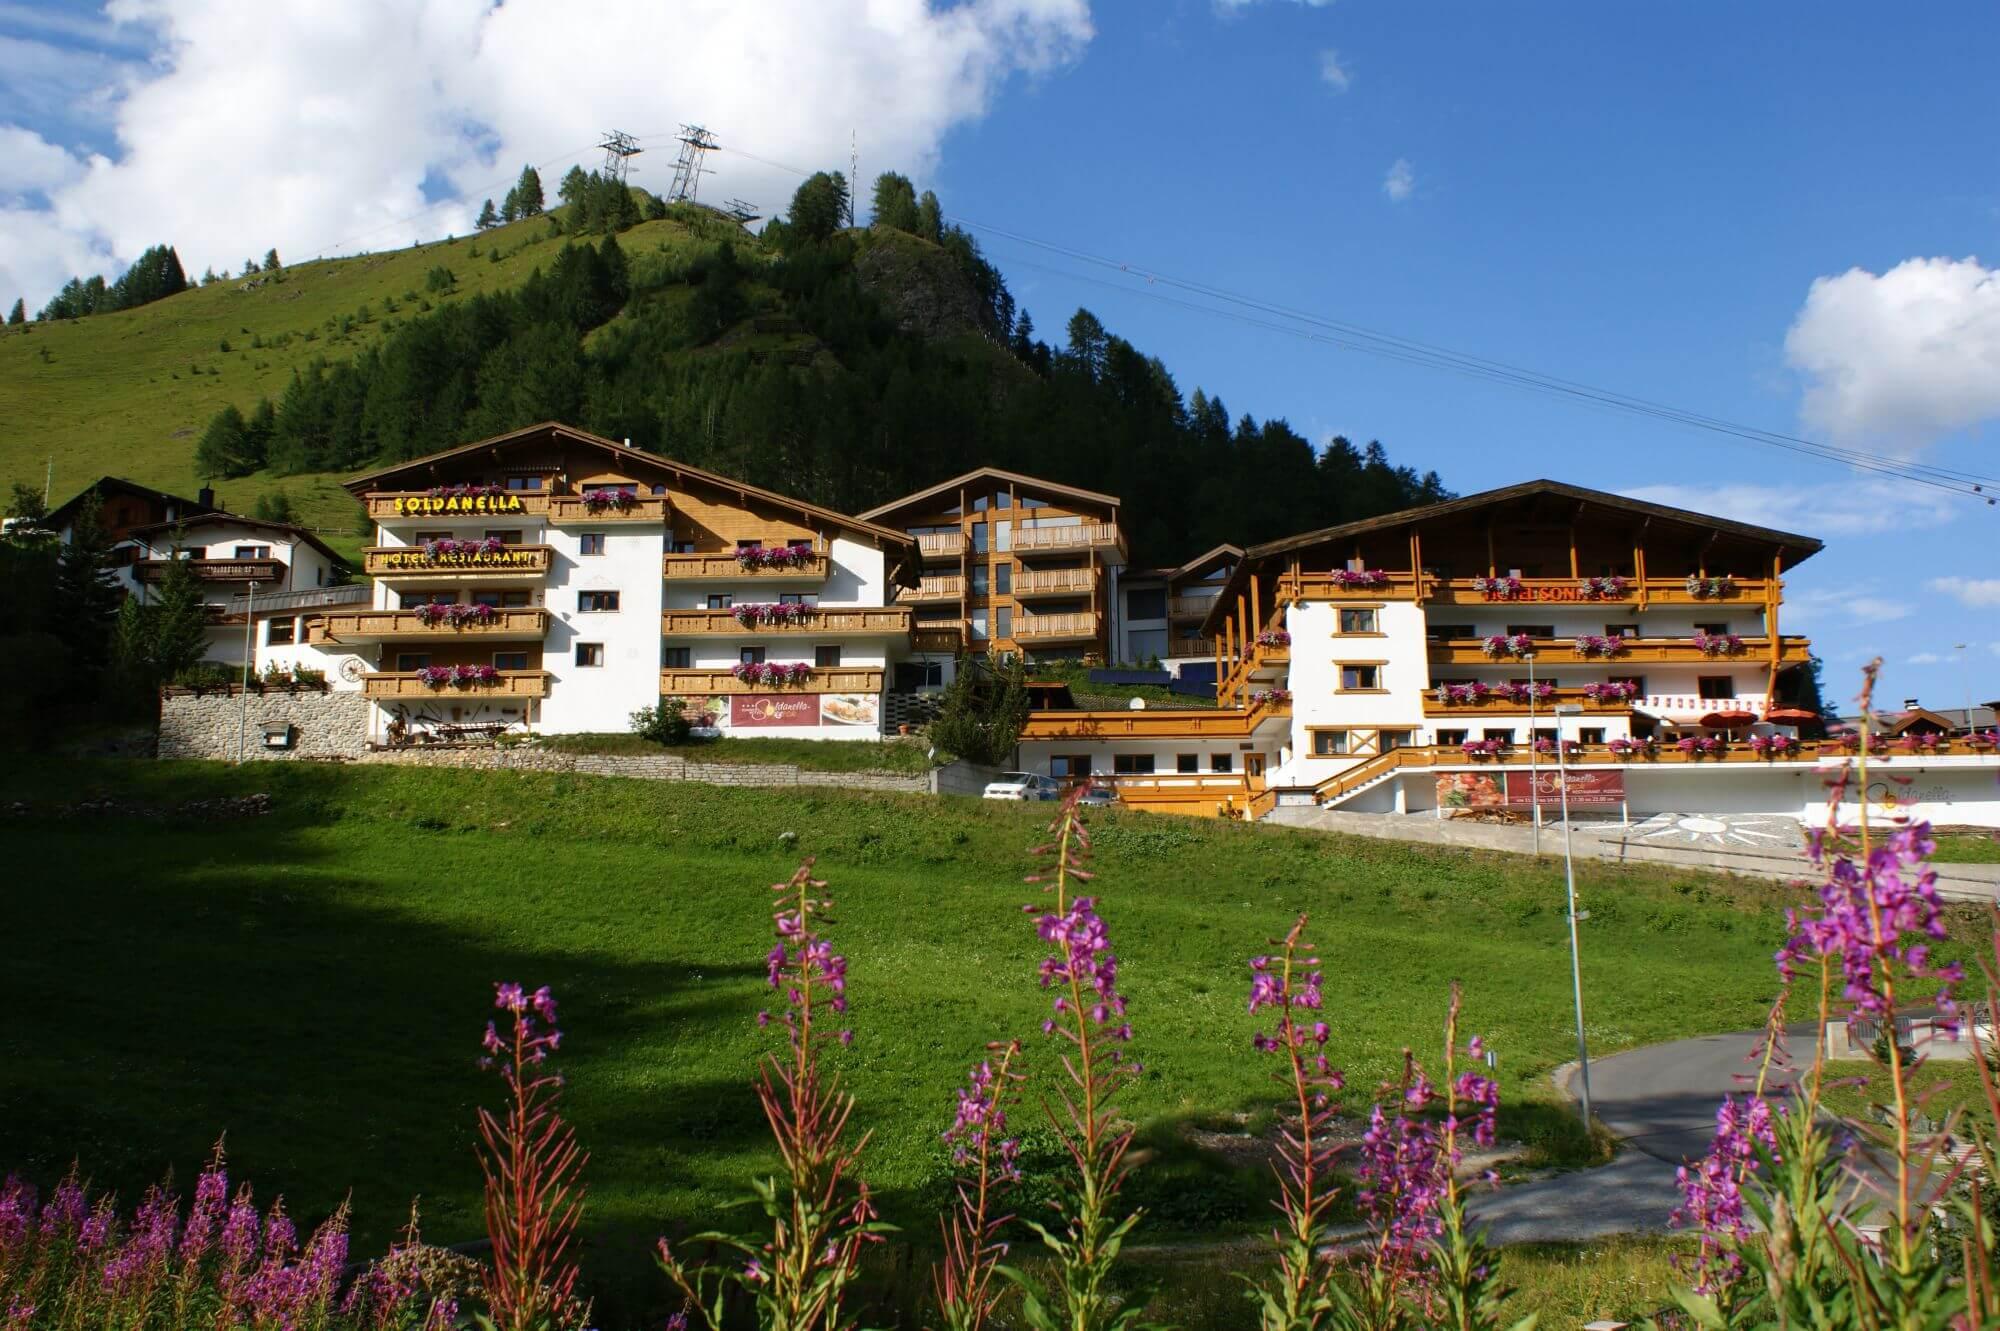 3-tage-im-sonnenhotel-soldanella-sonneck-in-samnaun